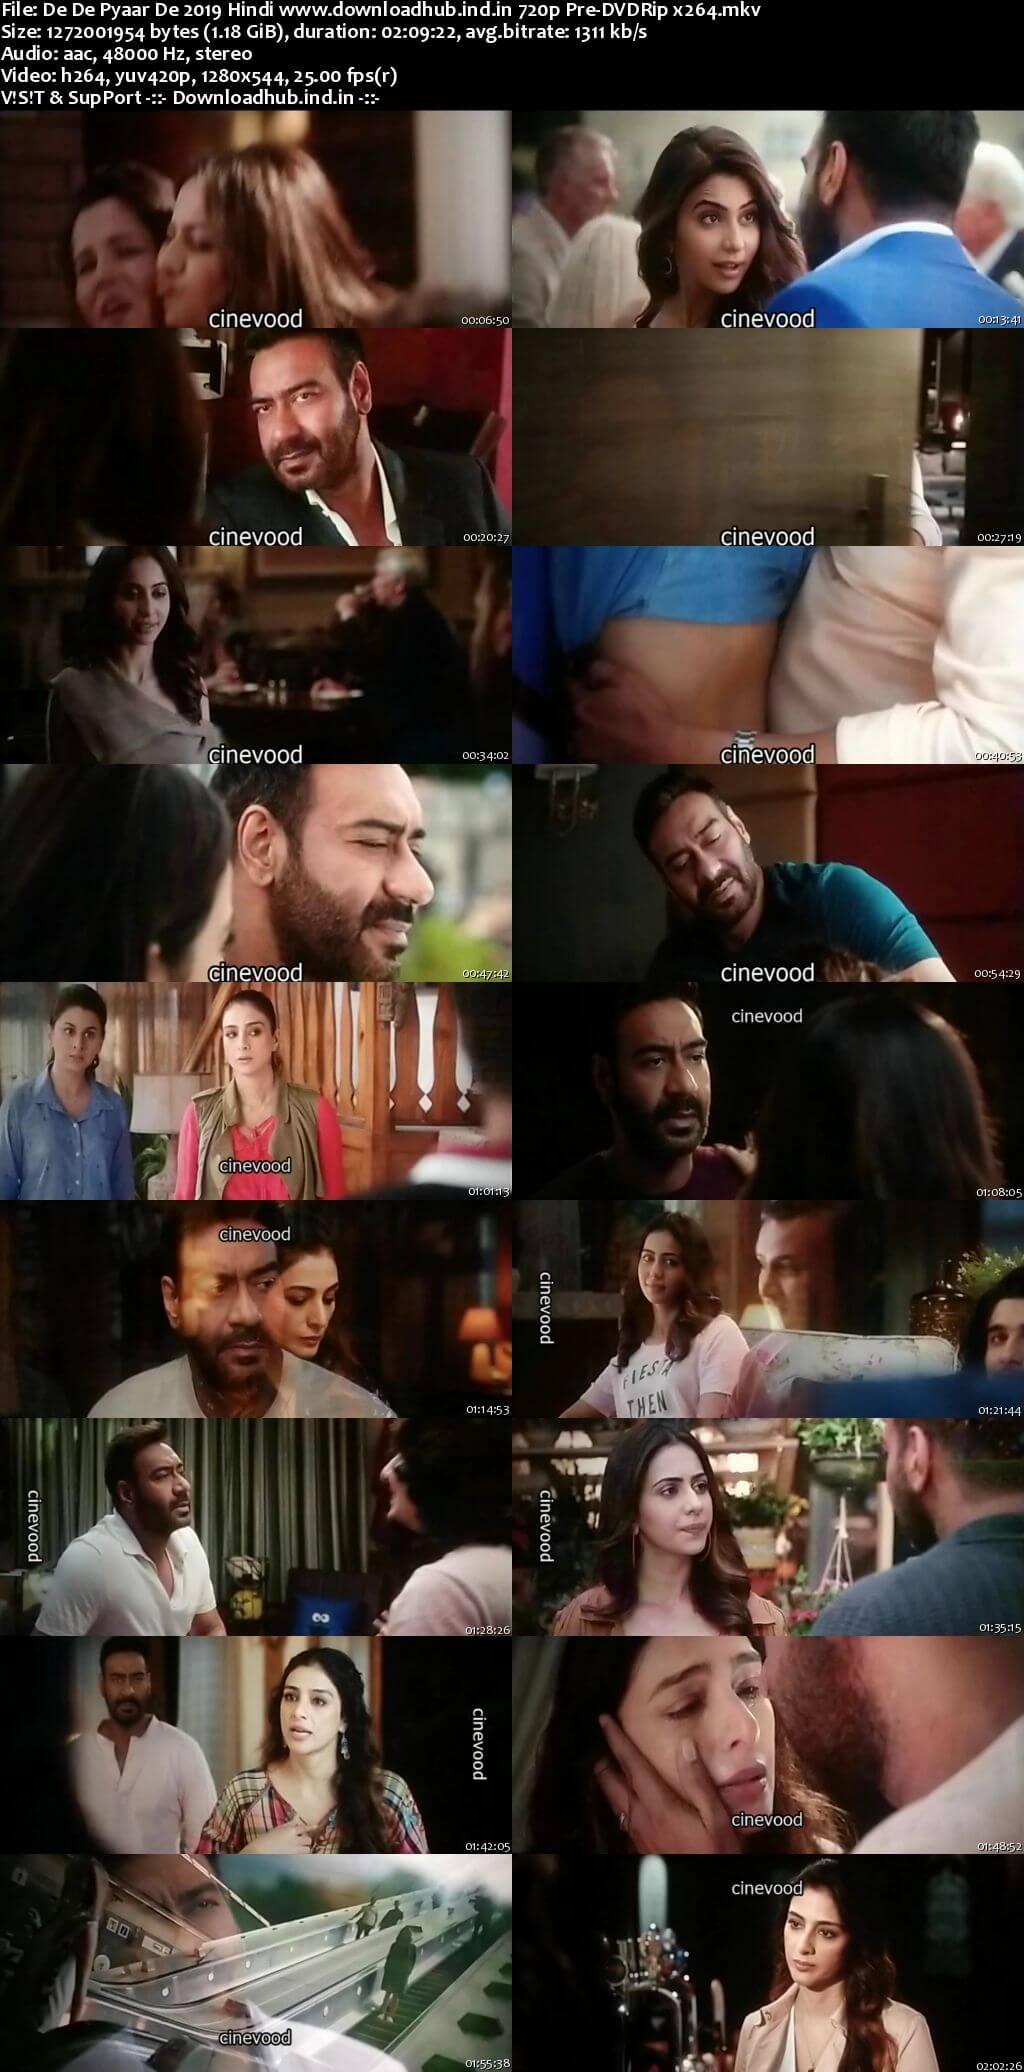 De De Pyaar De 2019 Hindi 720p Pre-DVDRip x264